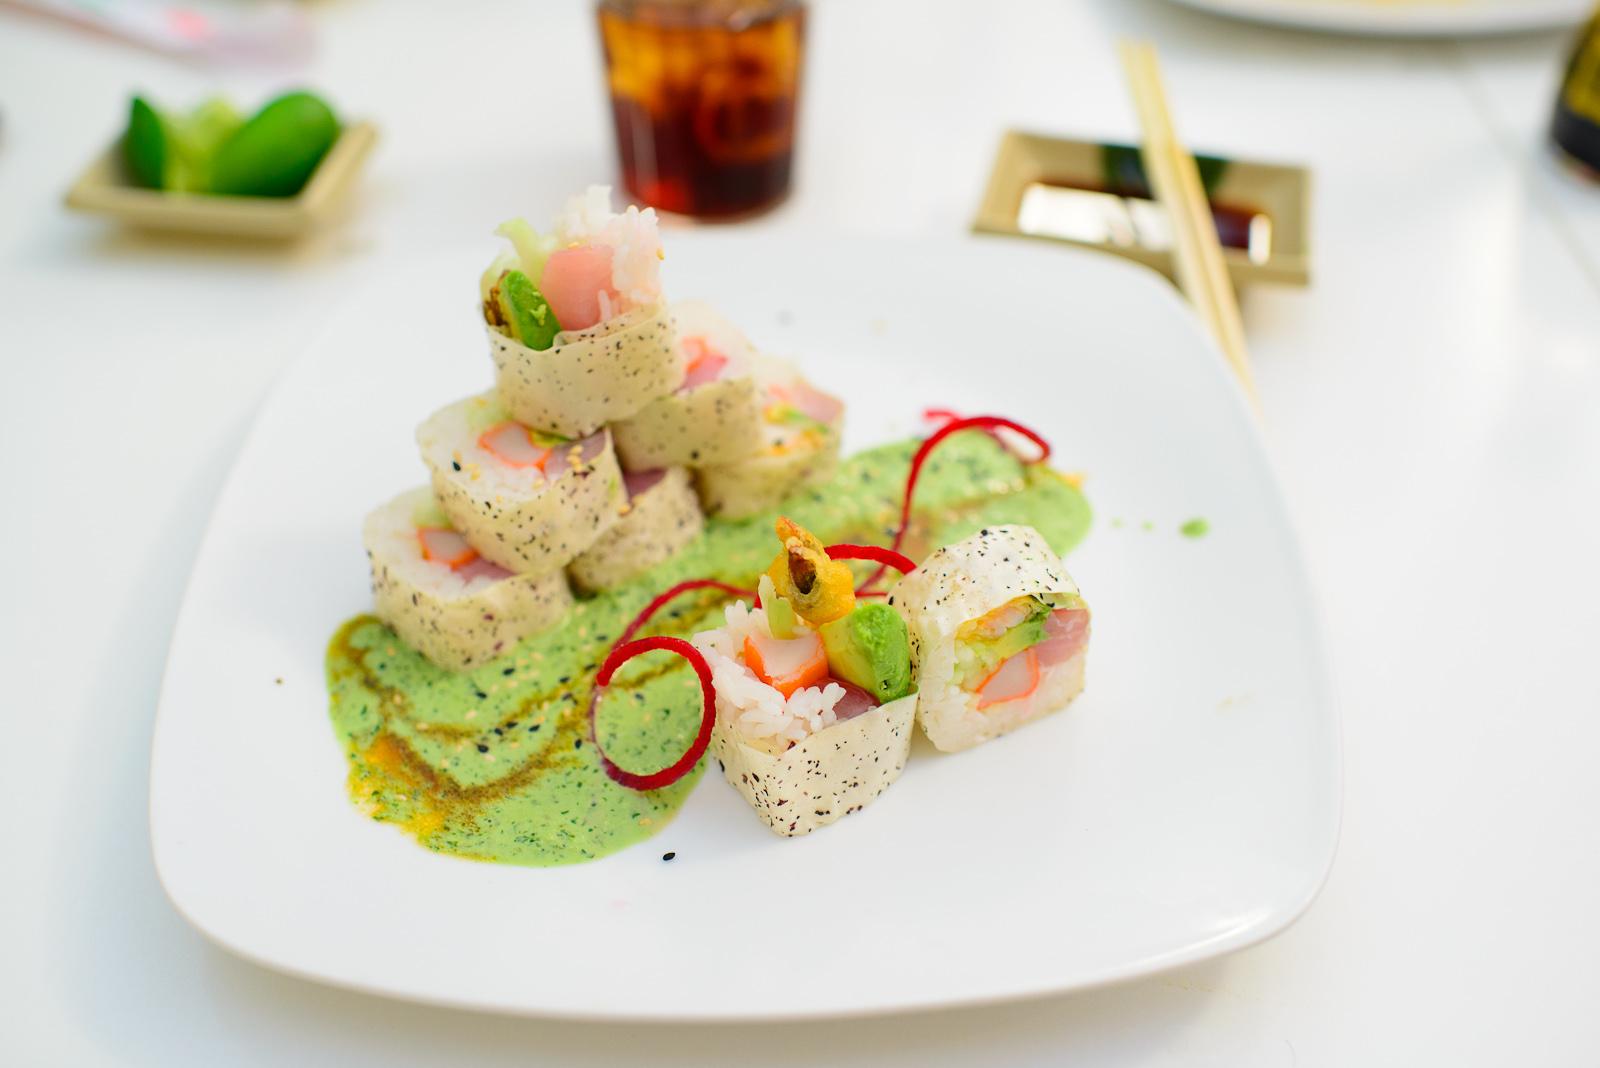 Anitza Roll - Cangrejo, camarón tempura, atún, dorado, aguacat